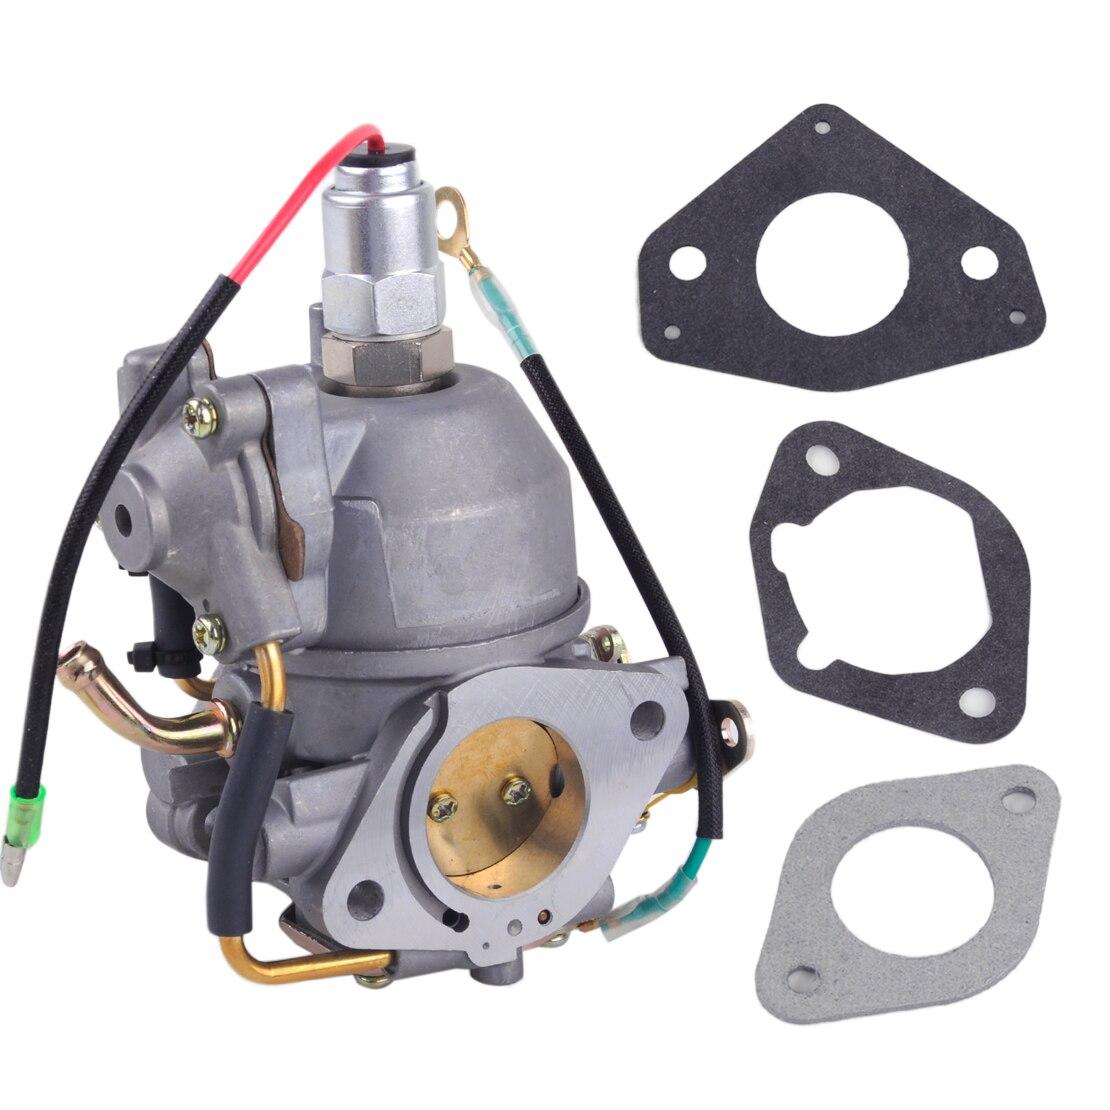 цена на LETAOSK Carburetor Carb with Solenoid Auto Engine Part fit for Kohler CV730 CV740 24853102-S 24-853-102 Replacement